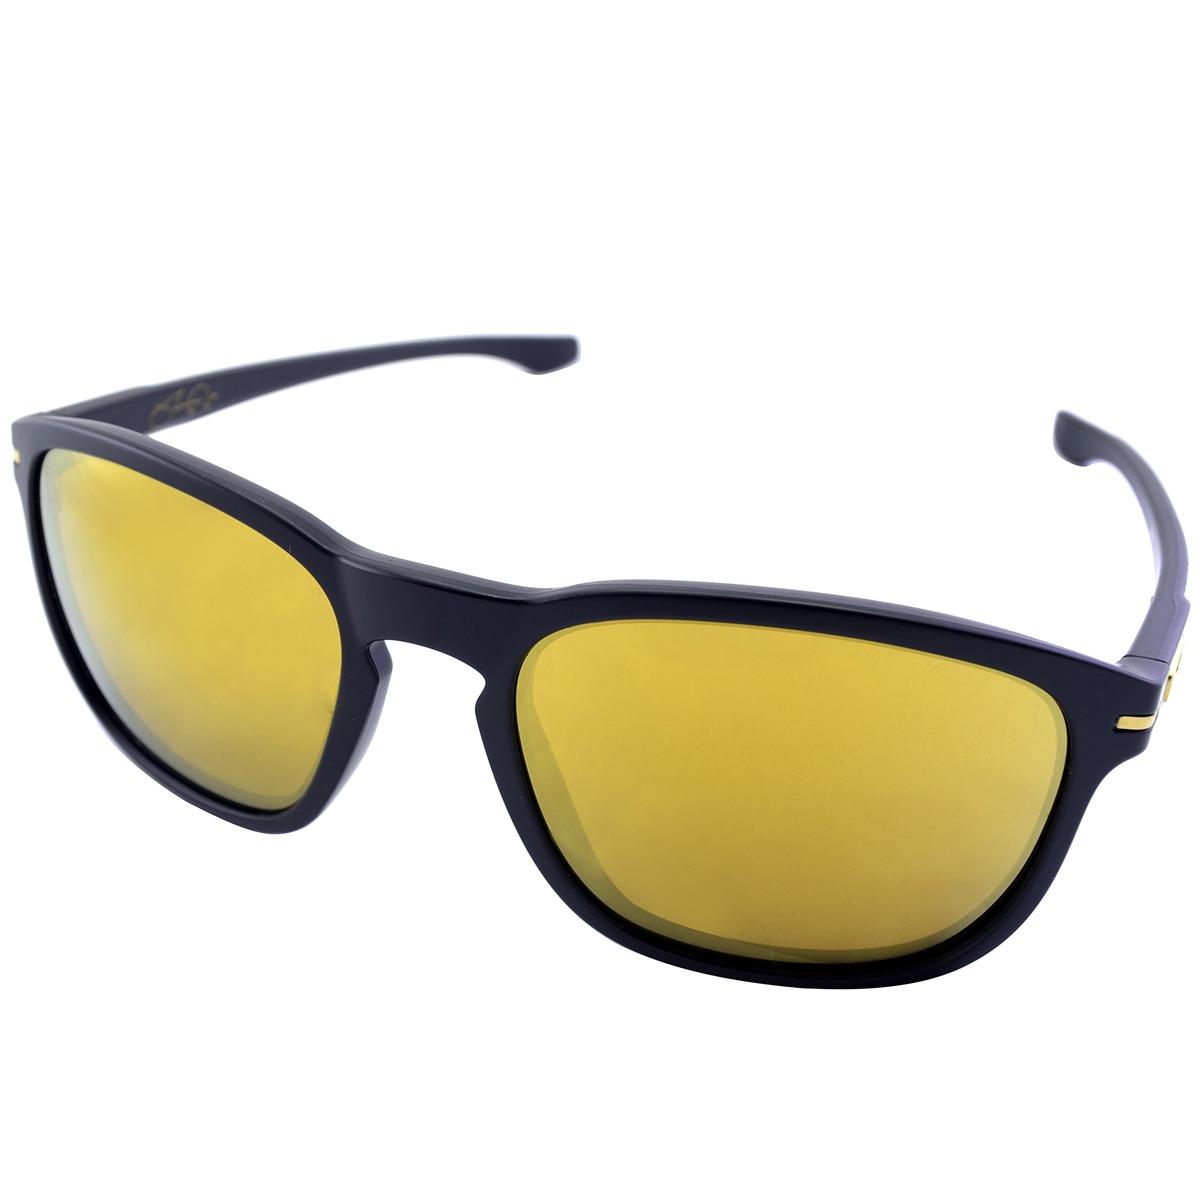 03ce4c5ec6 óculos oakley enduro shaun white matte black lente 24k iridi. Carregando  zoom.